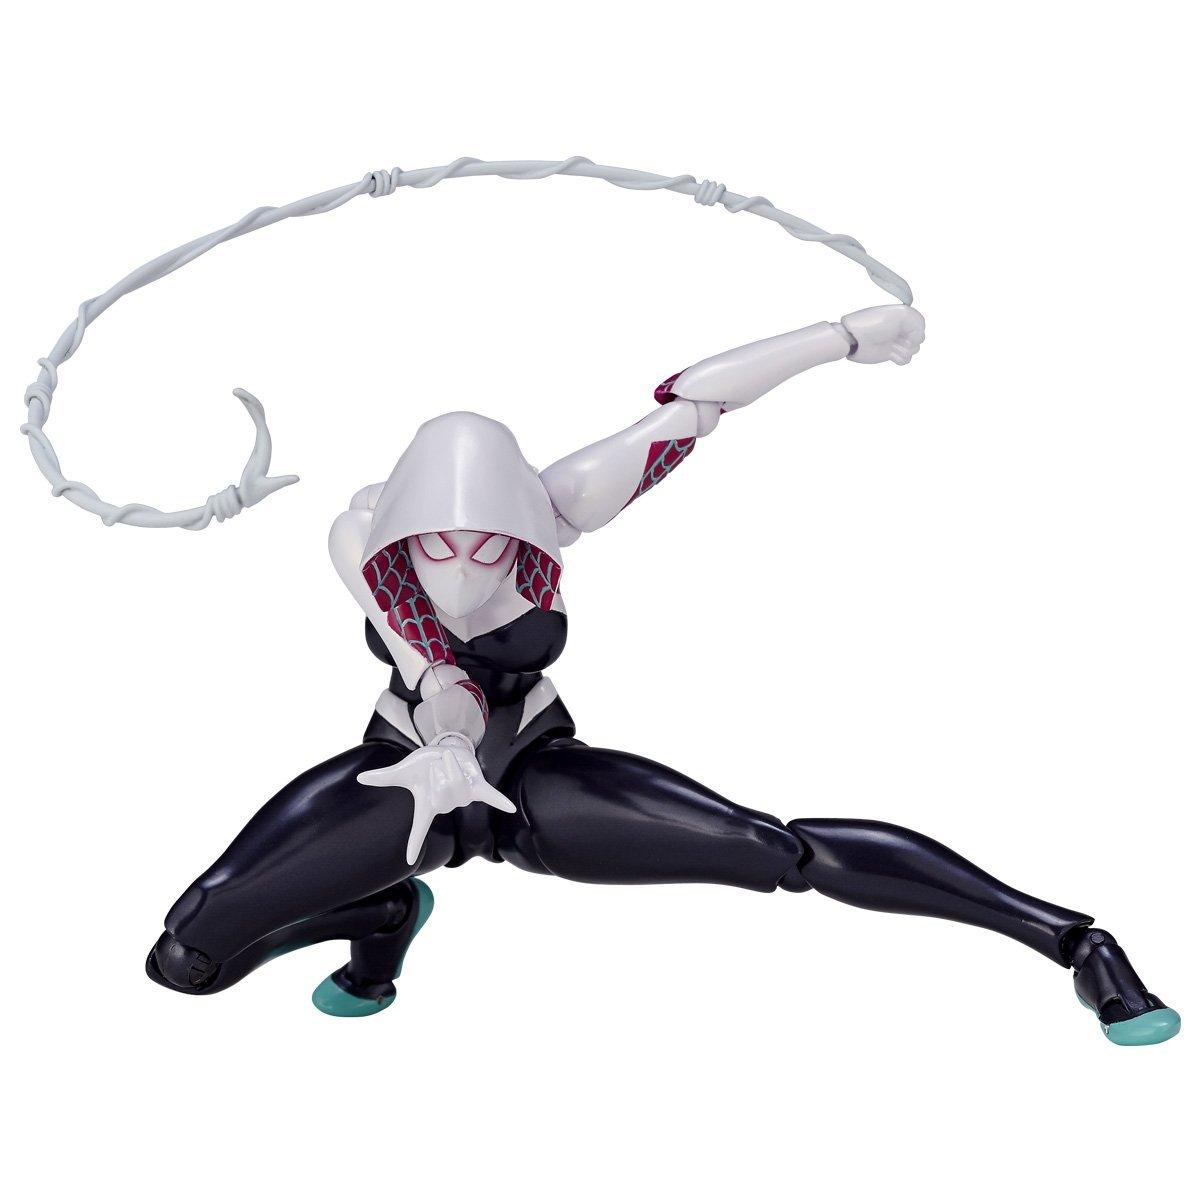 Revoltech Spider-Gwen Figure Official Details & Images